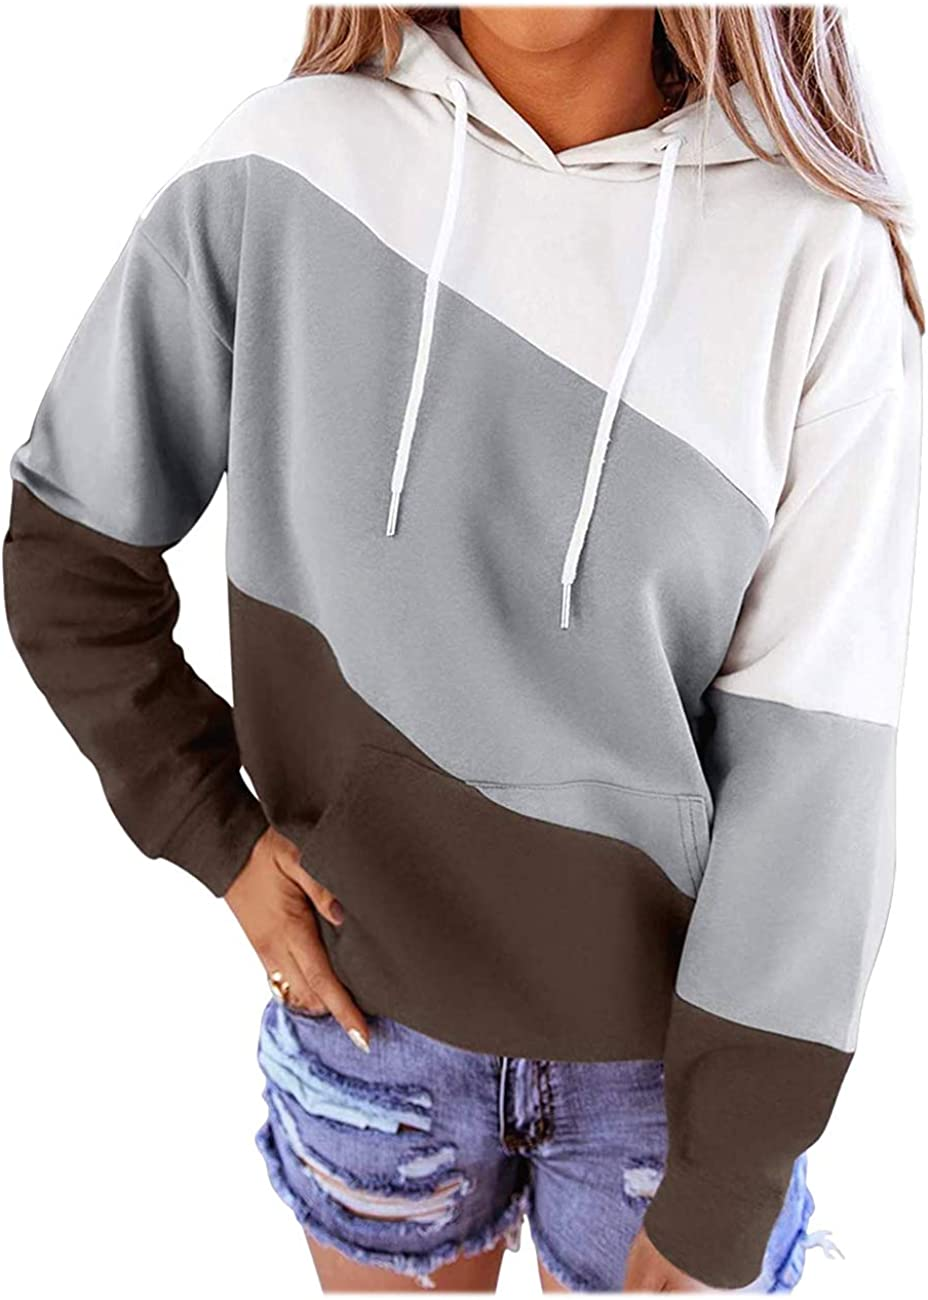 YASAKO Womens Plus Size Casual Tie Dye Camo Print Long Sleeve Shirts Crew Neck Loose Fit Sweatshirt Pullover Tops